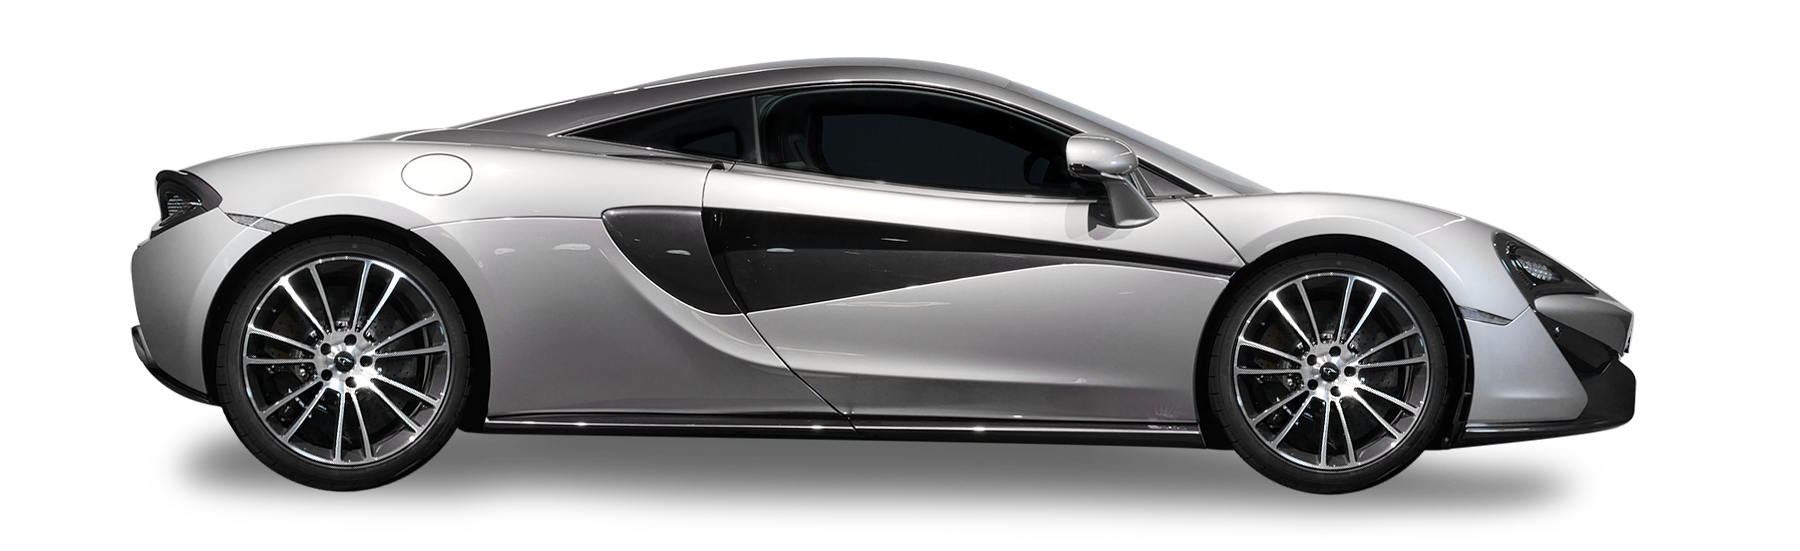 AIL McLaren Blade rechtes Profil